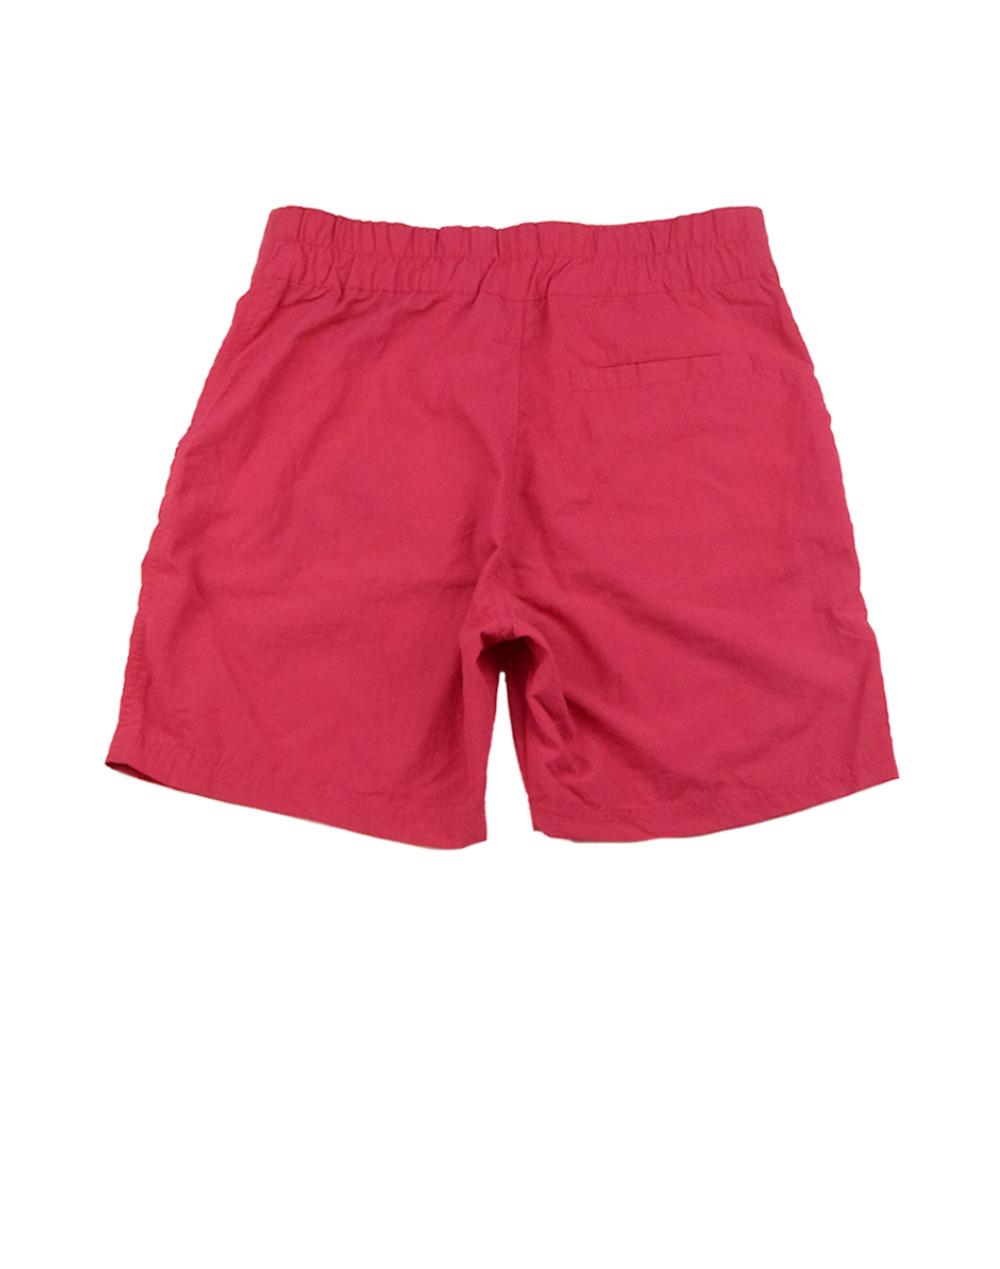 Converse Swim Short Pink (121MBSC-74)